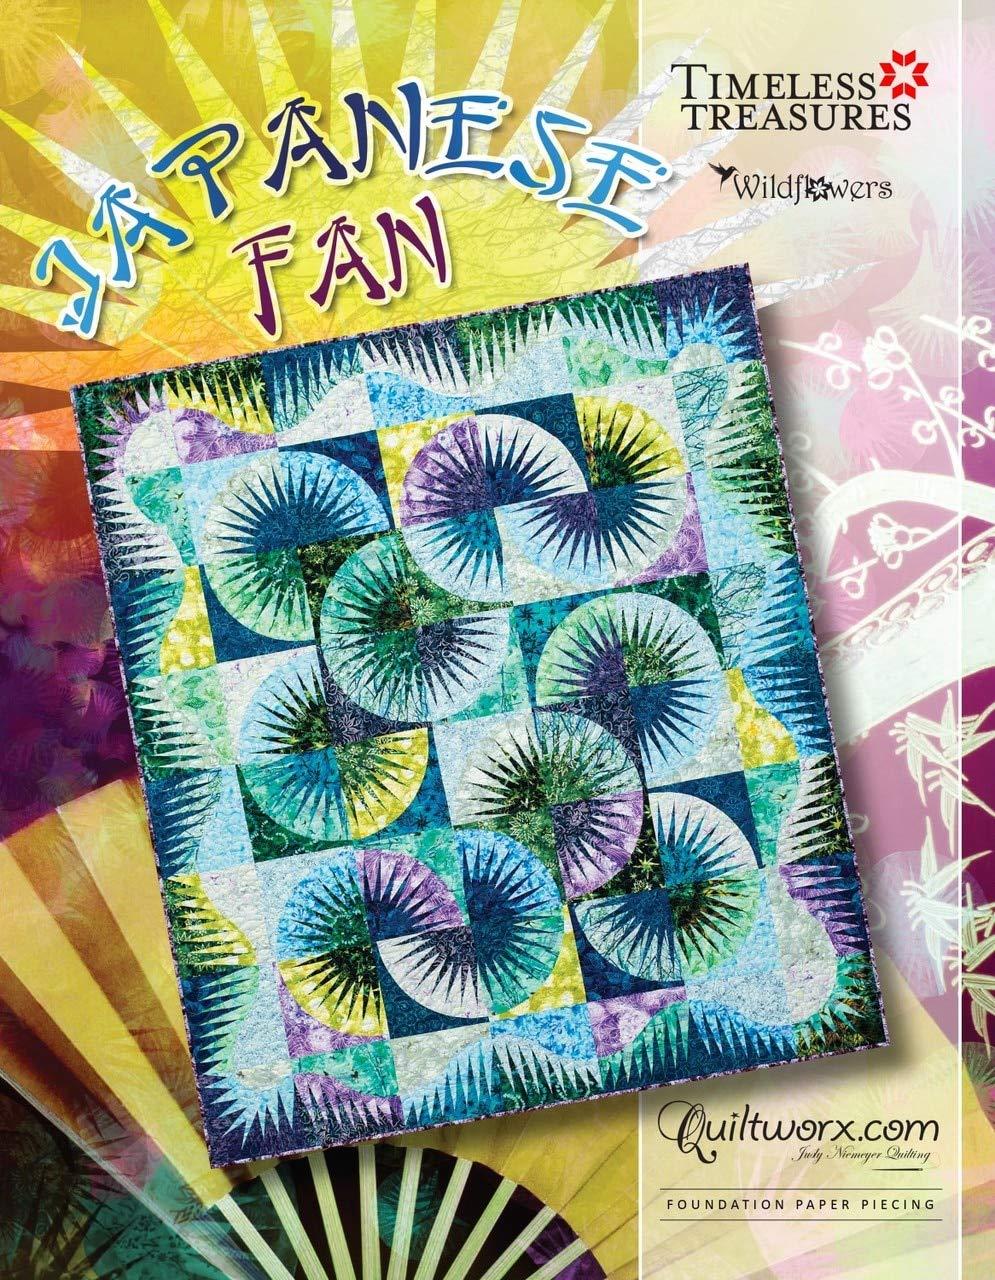 Japanese Fan Quilt Pattern 70 x 80~Foundation Paper Piecing Pattern by Judy Niemeyer of Quiltworx by Judy Niemeyer